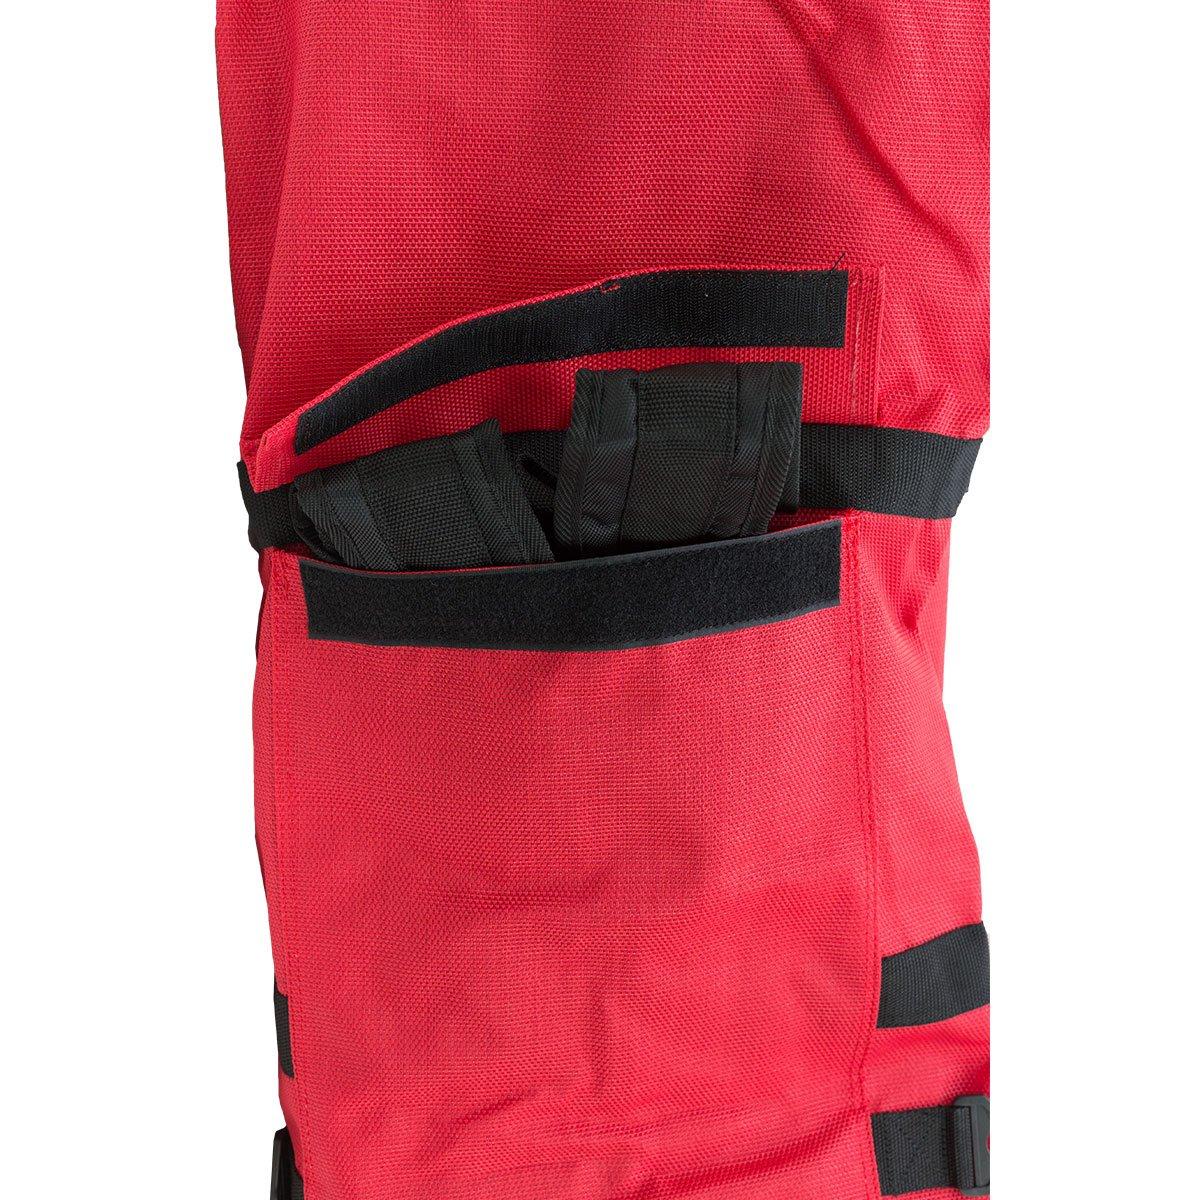 Armor #166 Amphibian Mesh Duffel Durable Bag Backpack